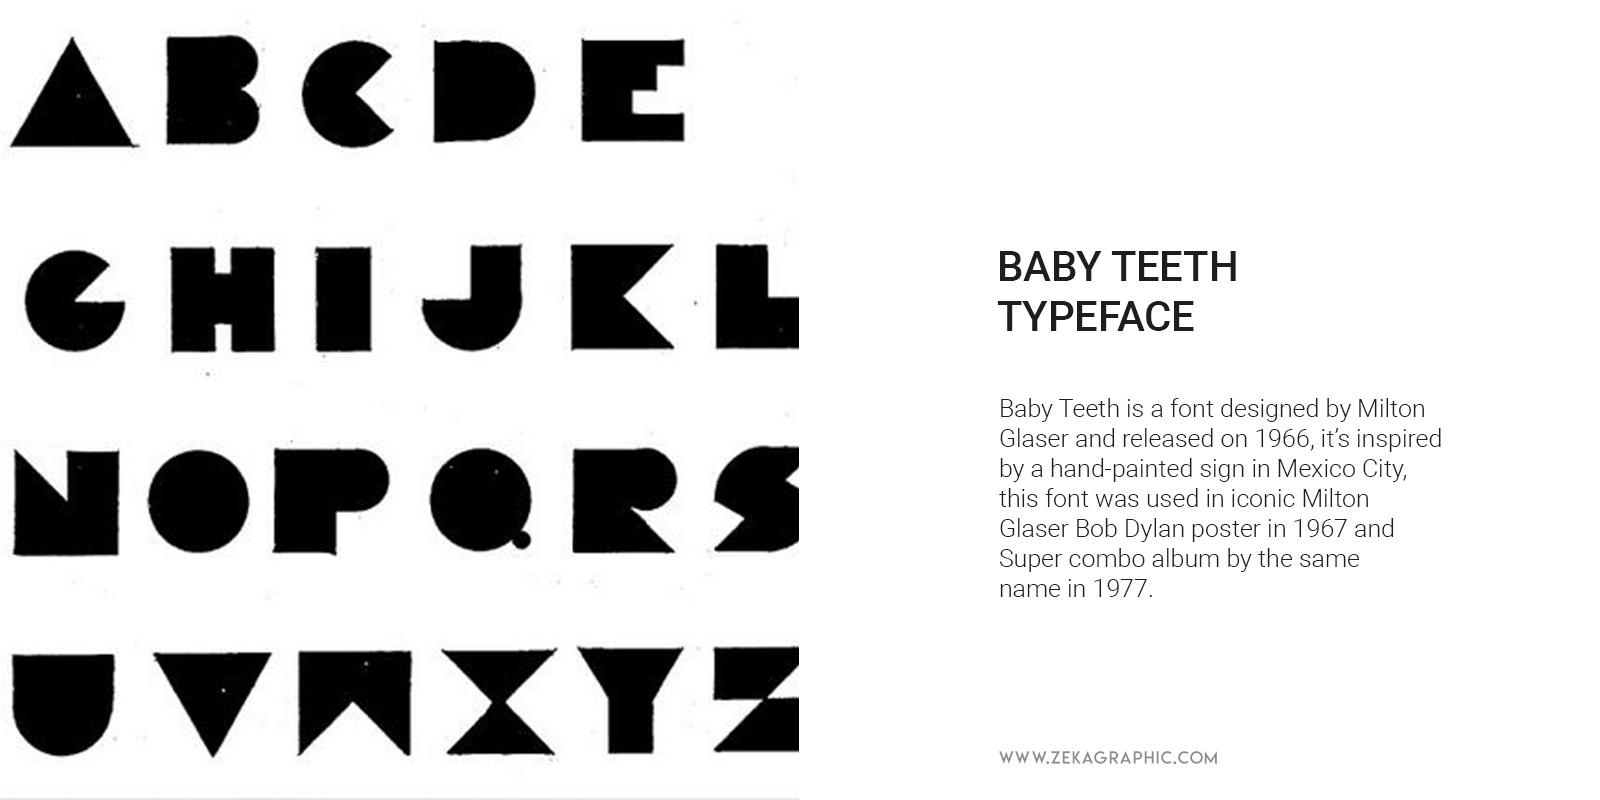 Babyteeth typeface by Milton Glaser Graphic Design History